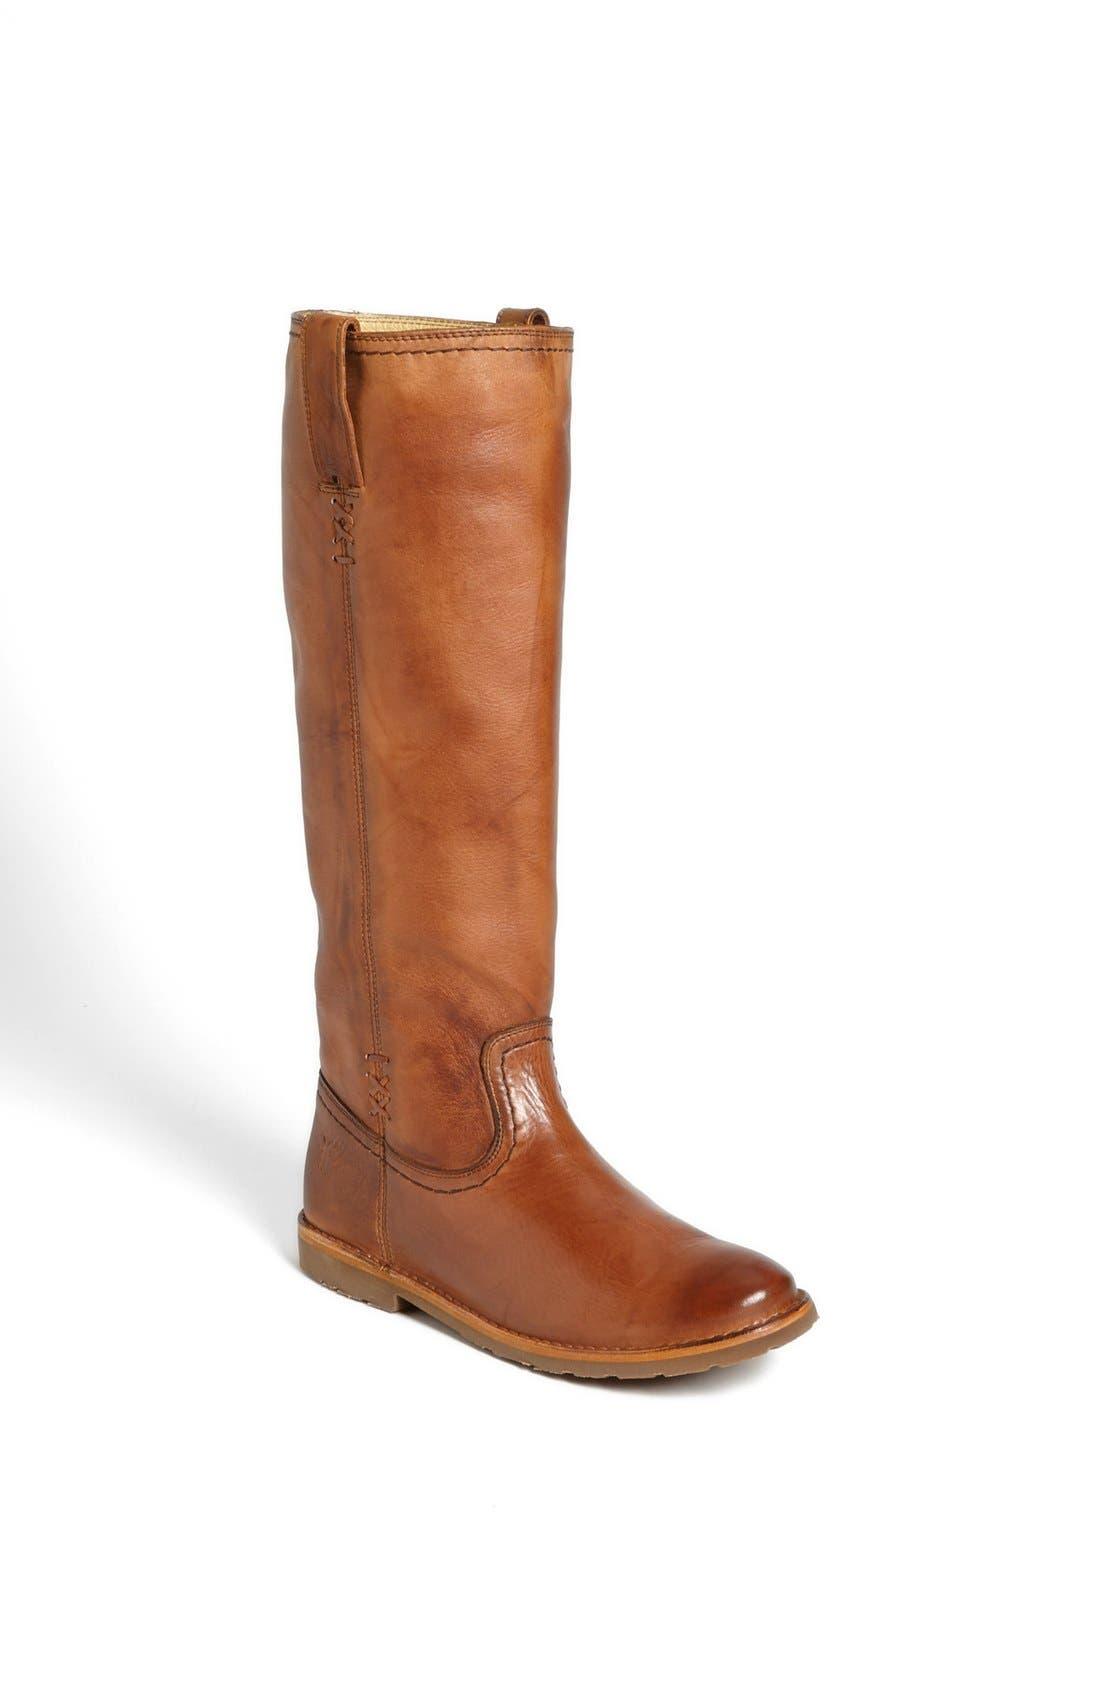 Main Image - Frye 'Celia' Boot